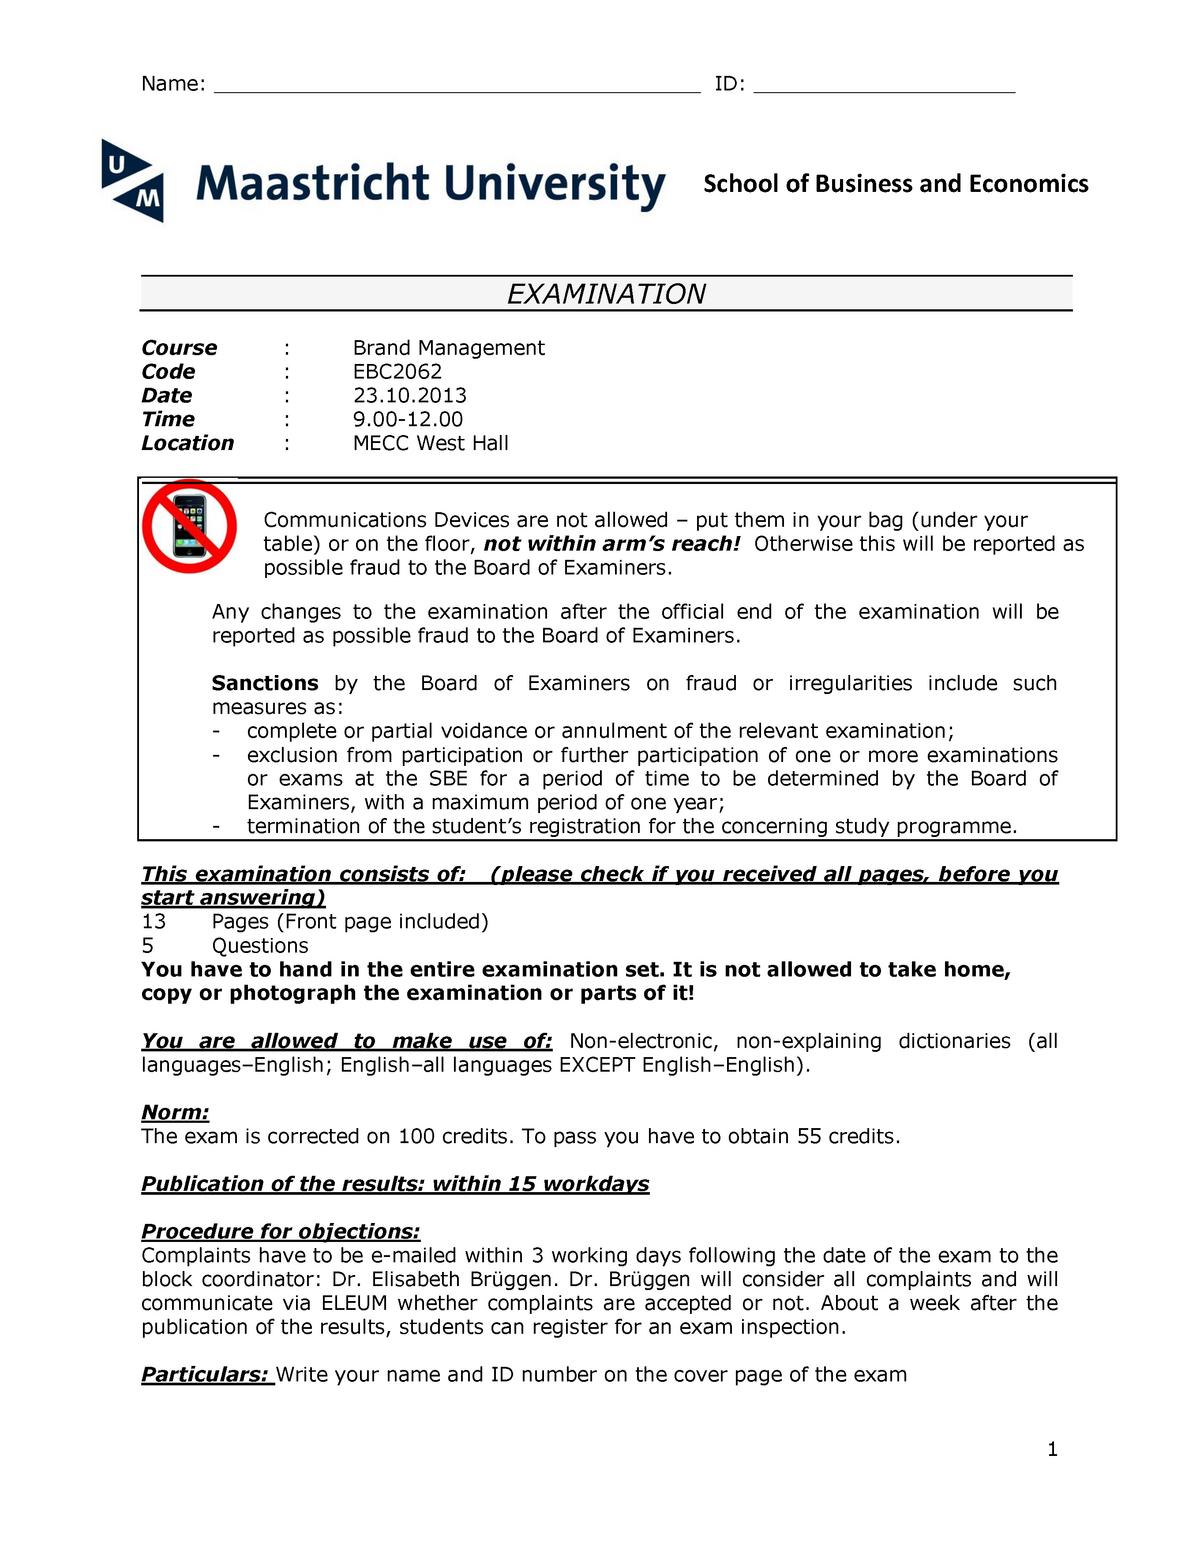 ca852fad97 Exam 2013 - EBC2062: Brand Management - StuDocu